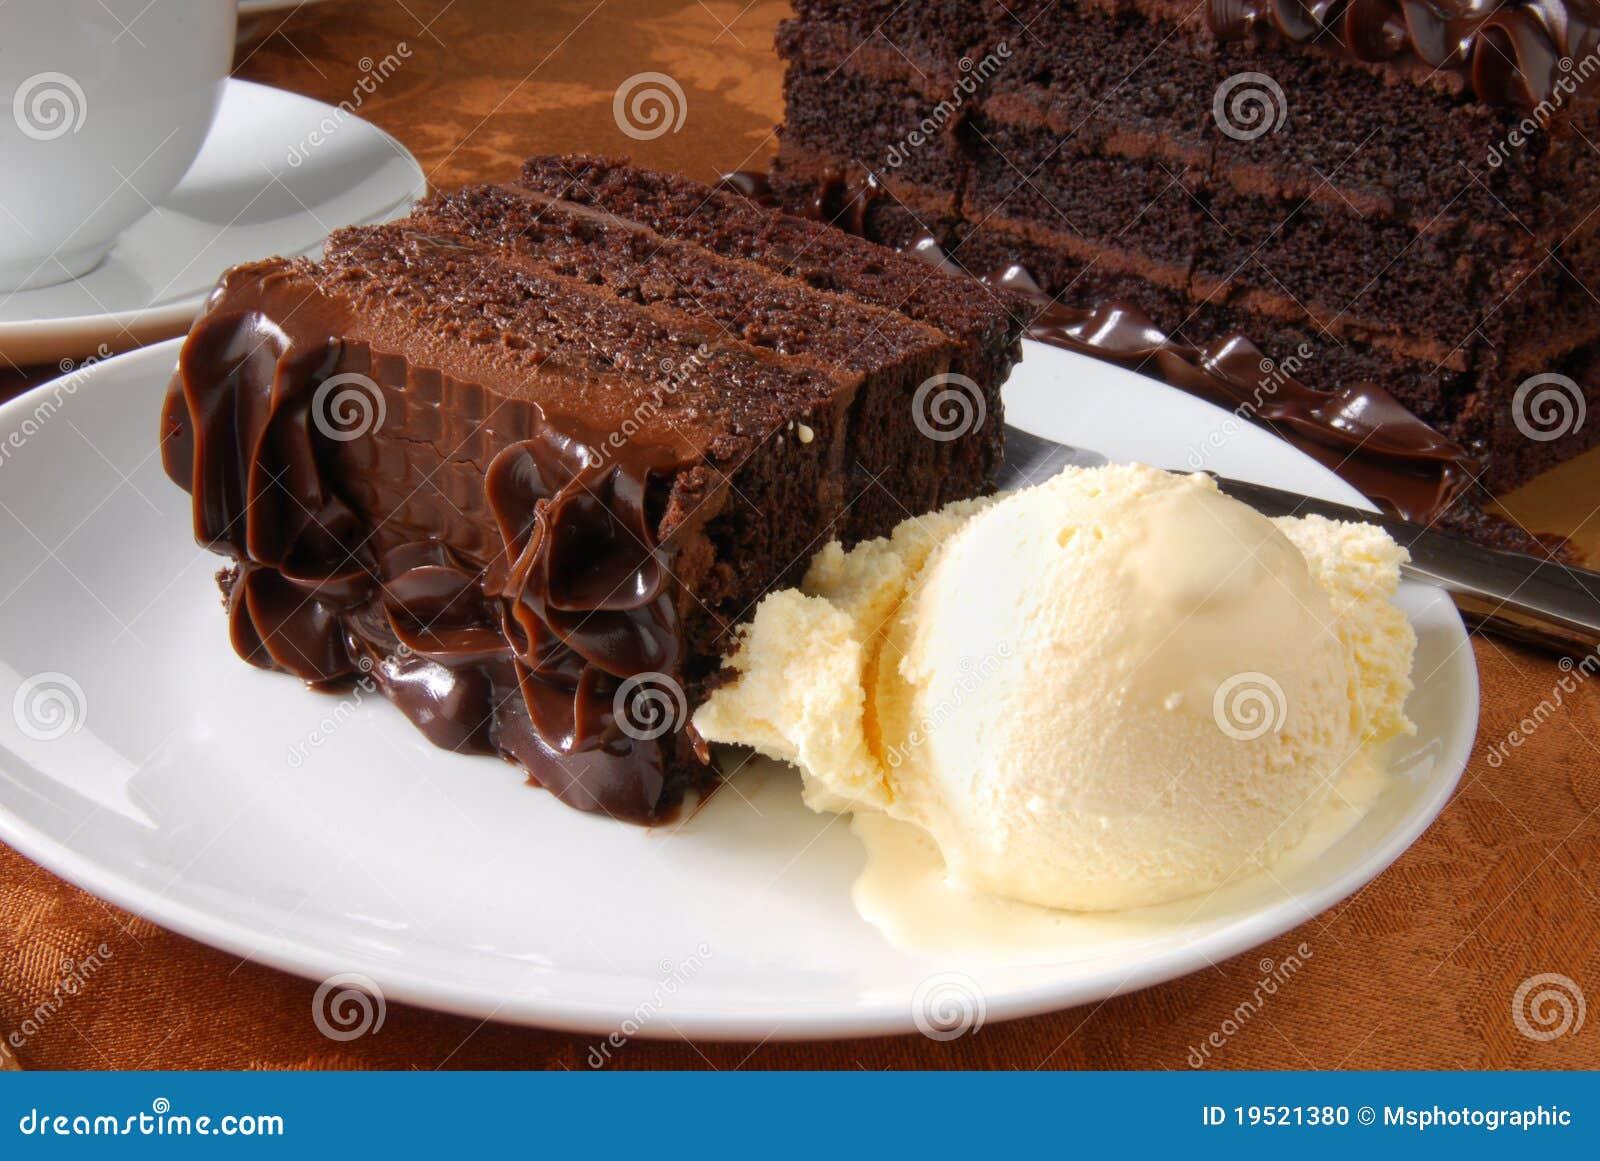 Cake And Ice Cream Stock Photo - Image: 19521380